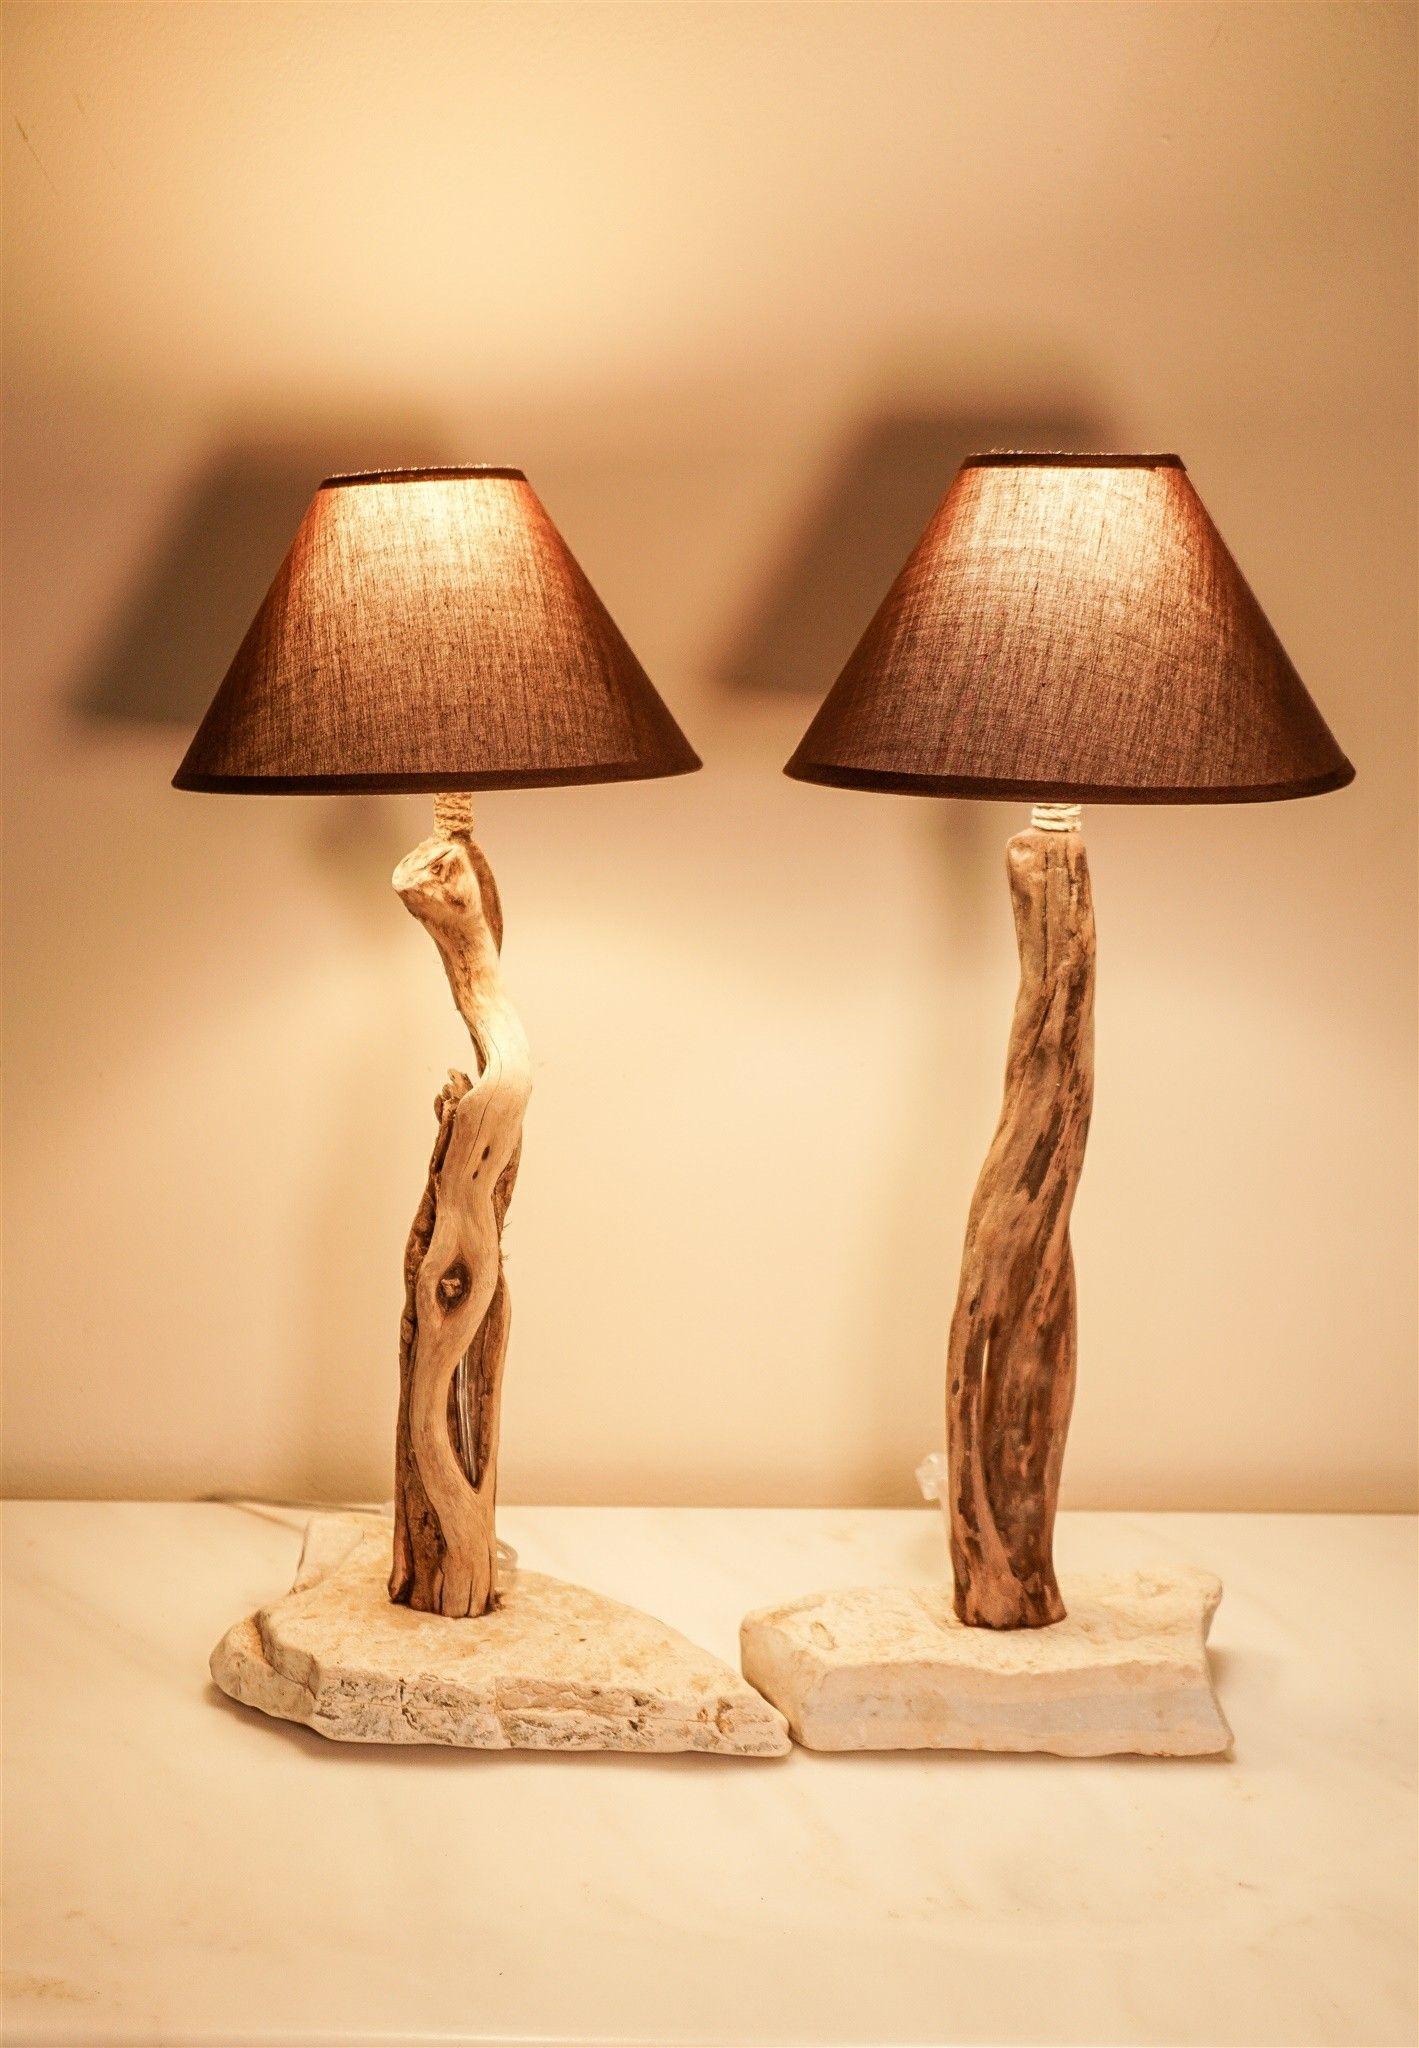 Rock Bases Driftwood Bedside Lamps Driftwood Lamp Wood Lamps Diy Light Fixtures